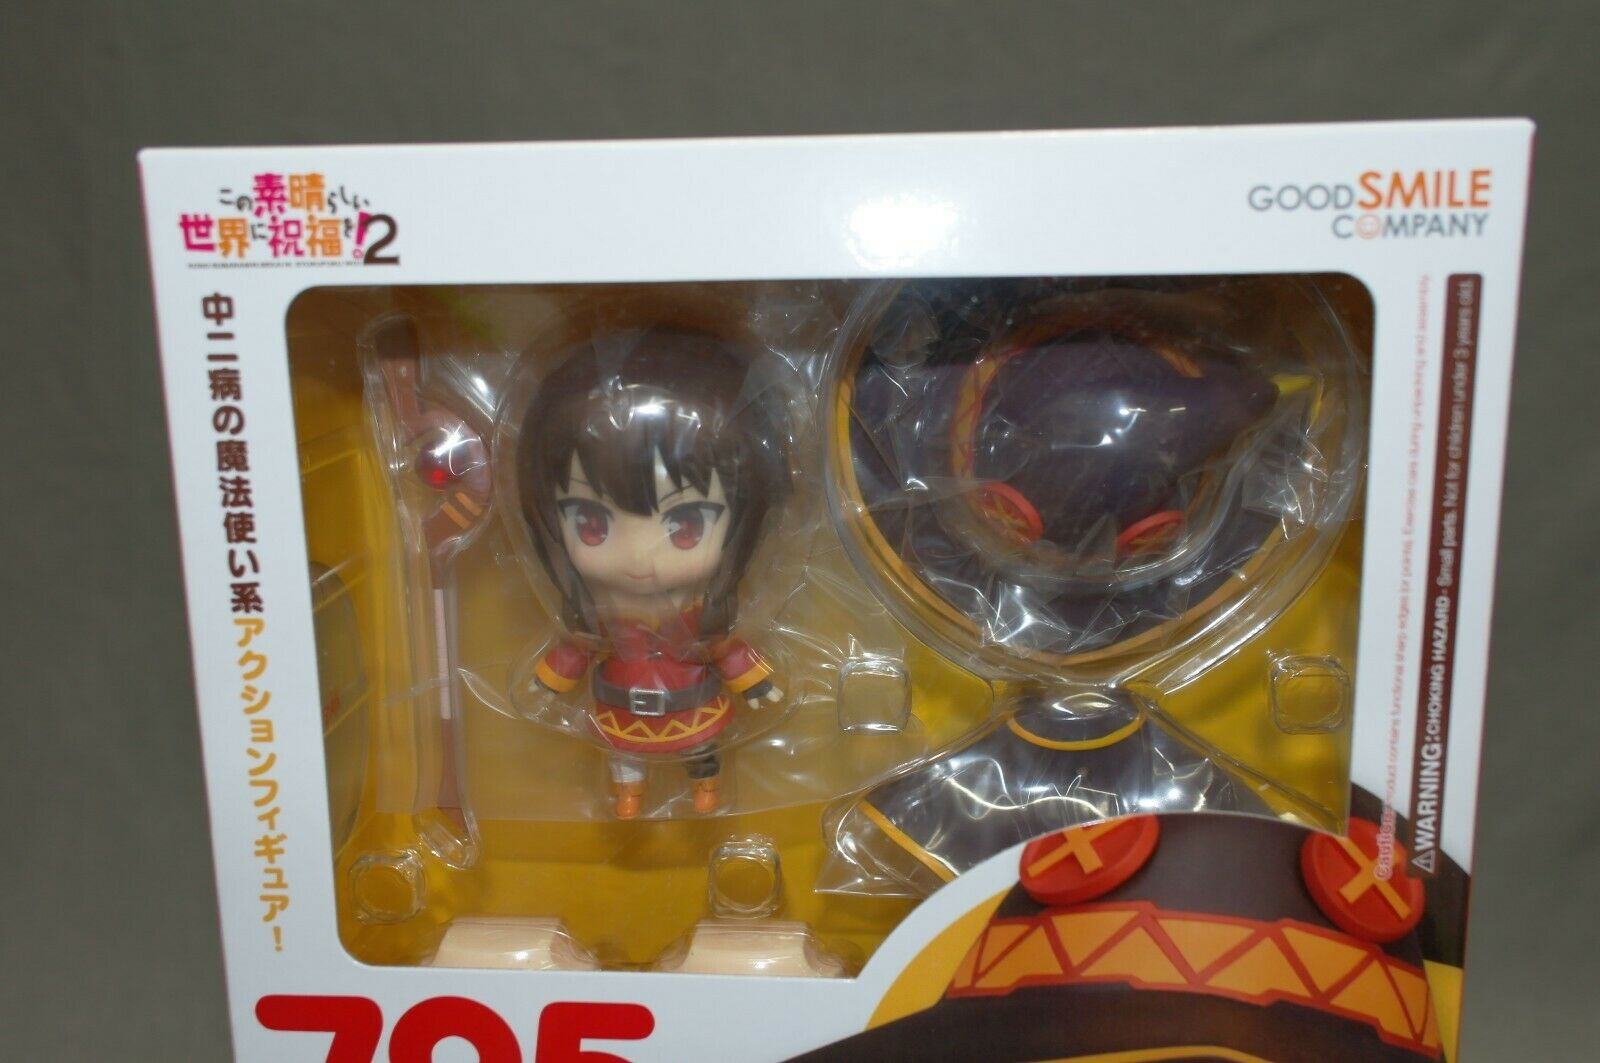 Nendoroid KonoSuba 2 Megumin Good Smile azienda Japan nuovoc nuovoc nuovoc 01a149